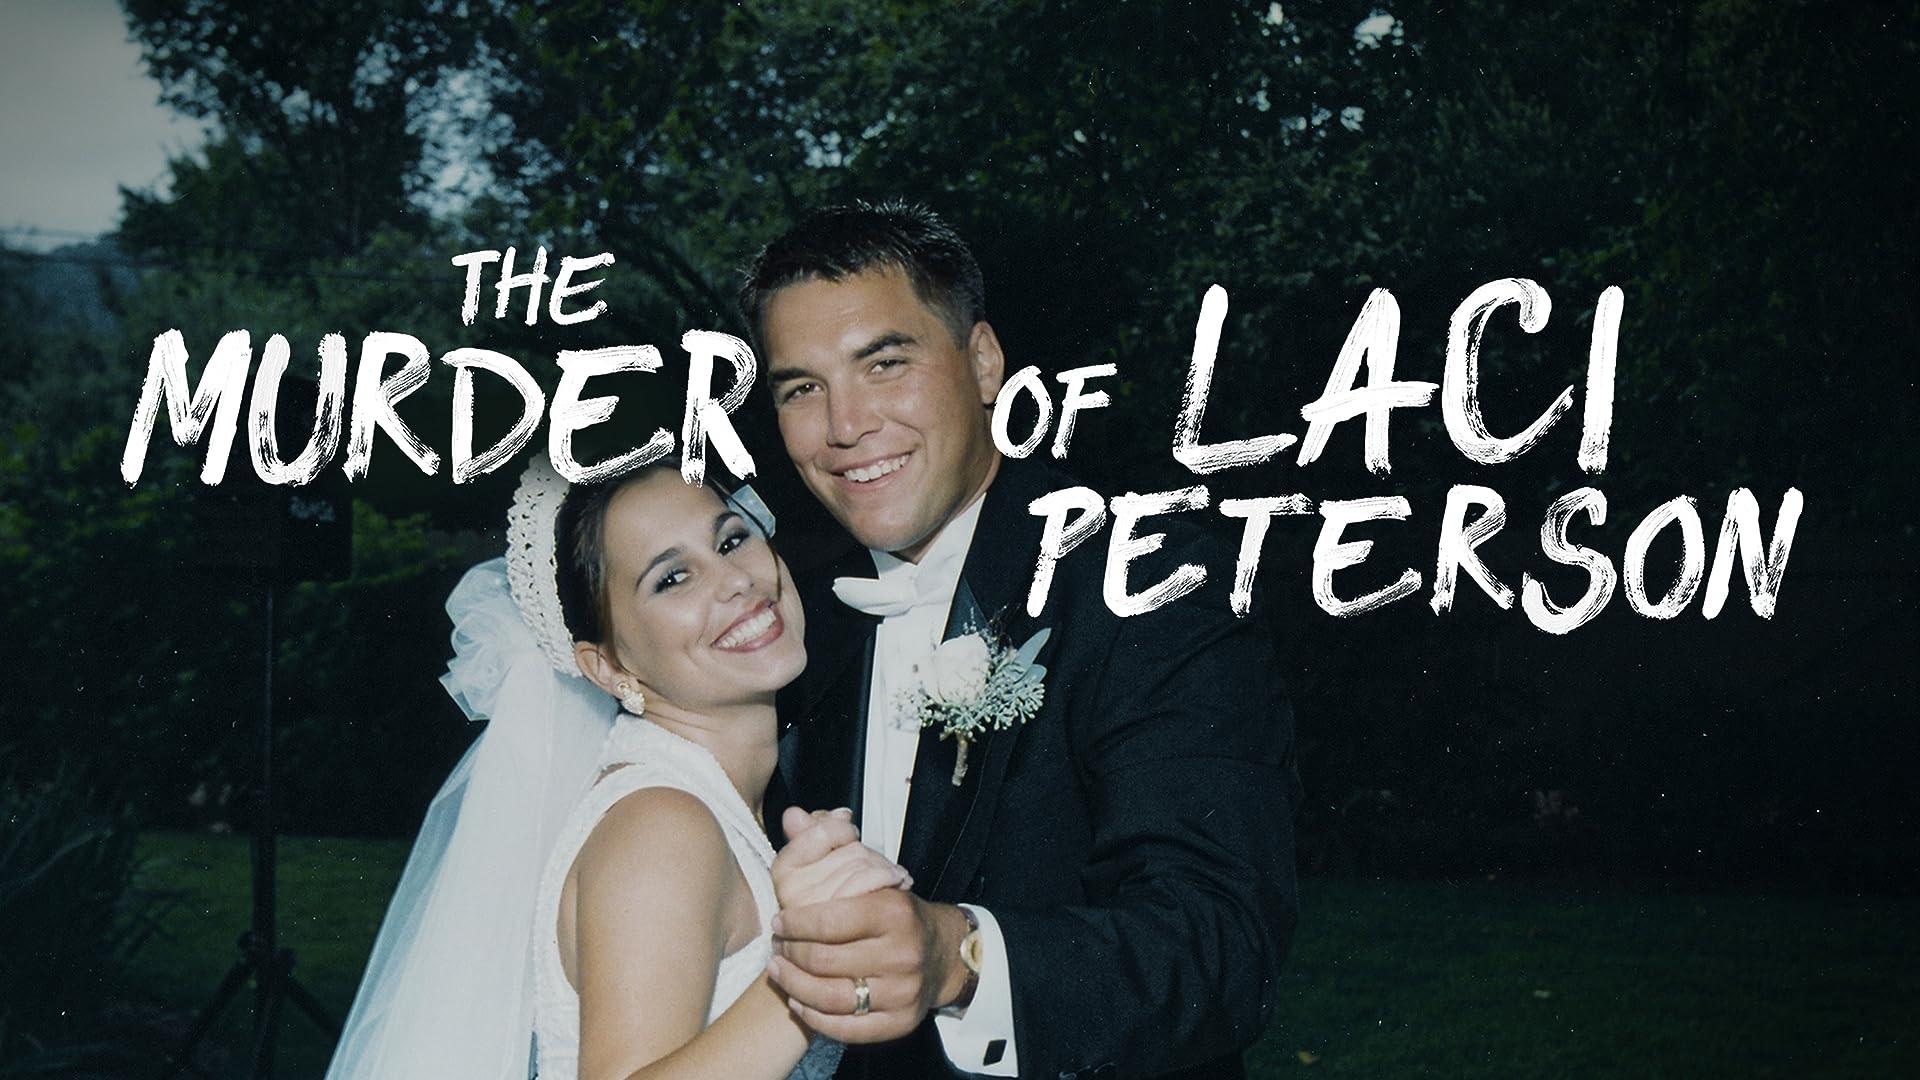 The Murder of Laci Peterson - Season 1